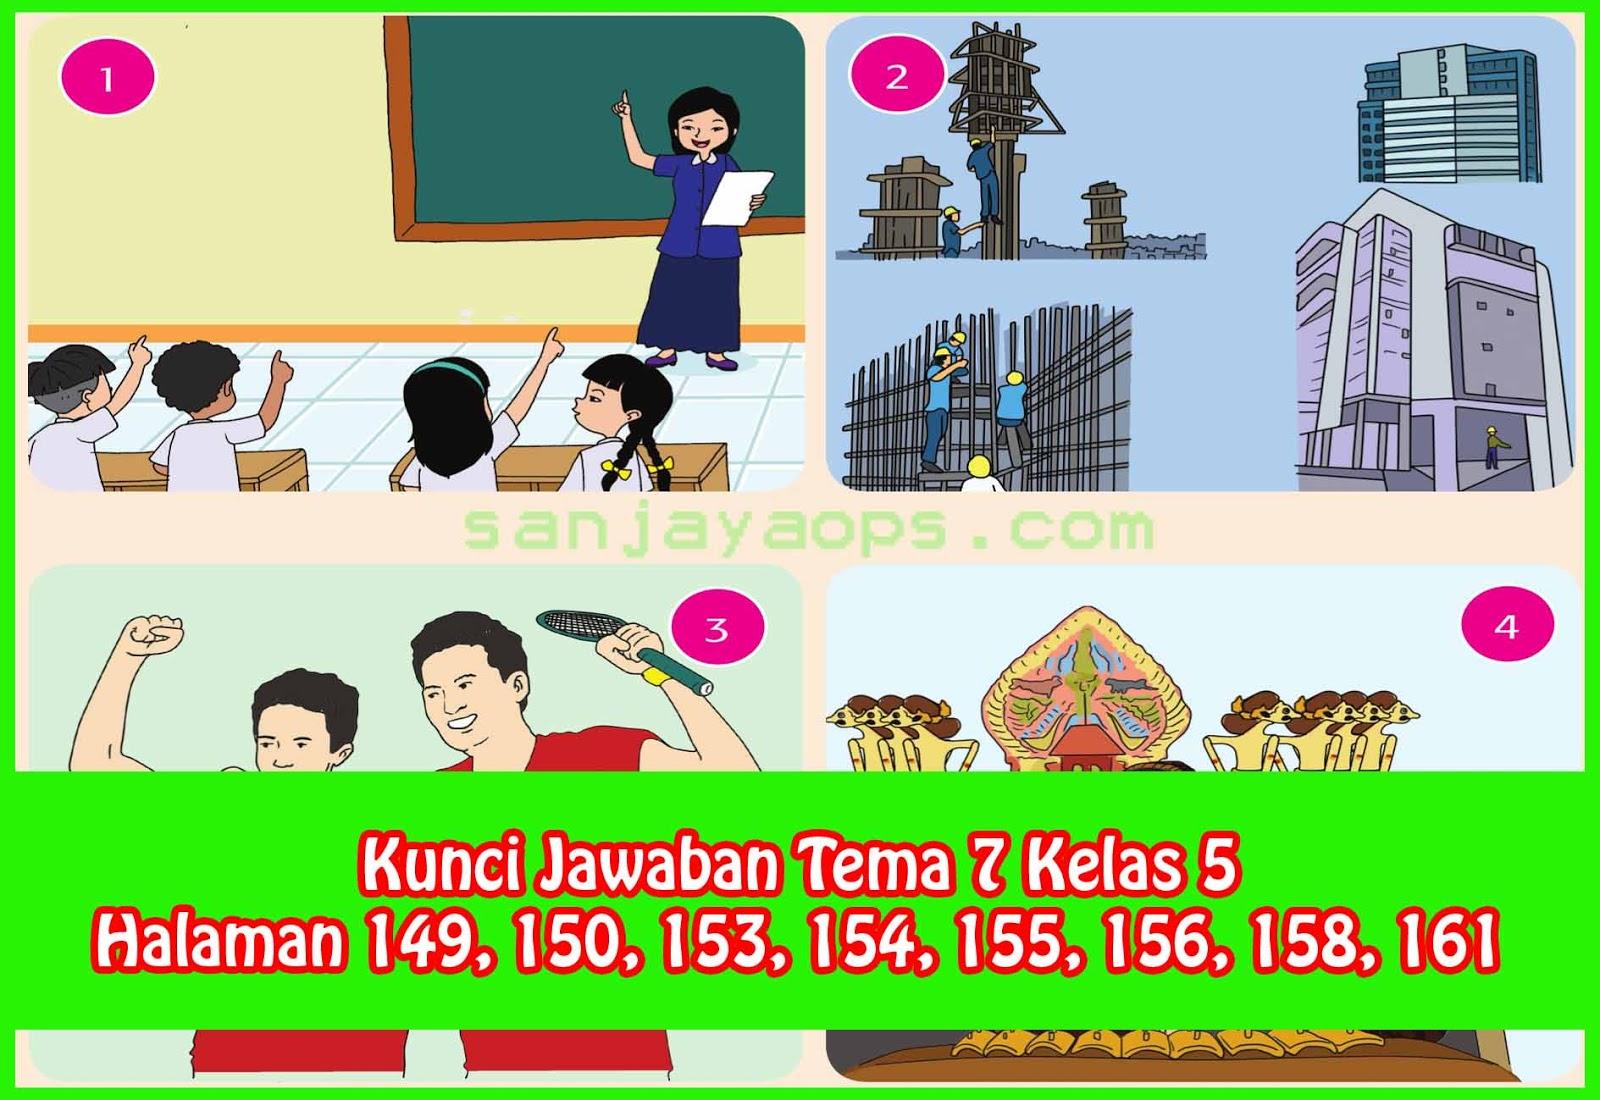 Kunci Jawaban Tema 7 Kelas 5 Halaman 149 150 153 154 155 156 158 161 Sanjayaops